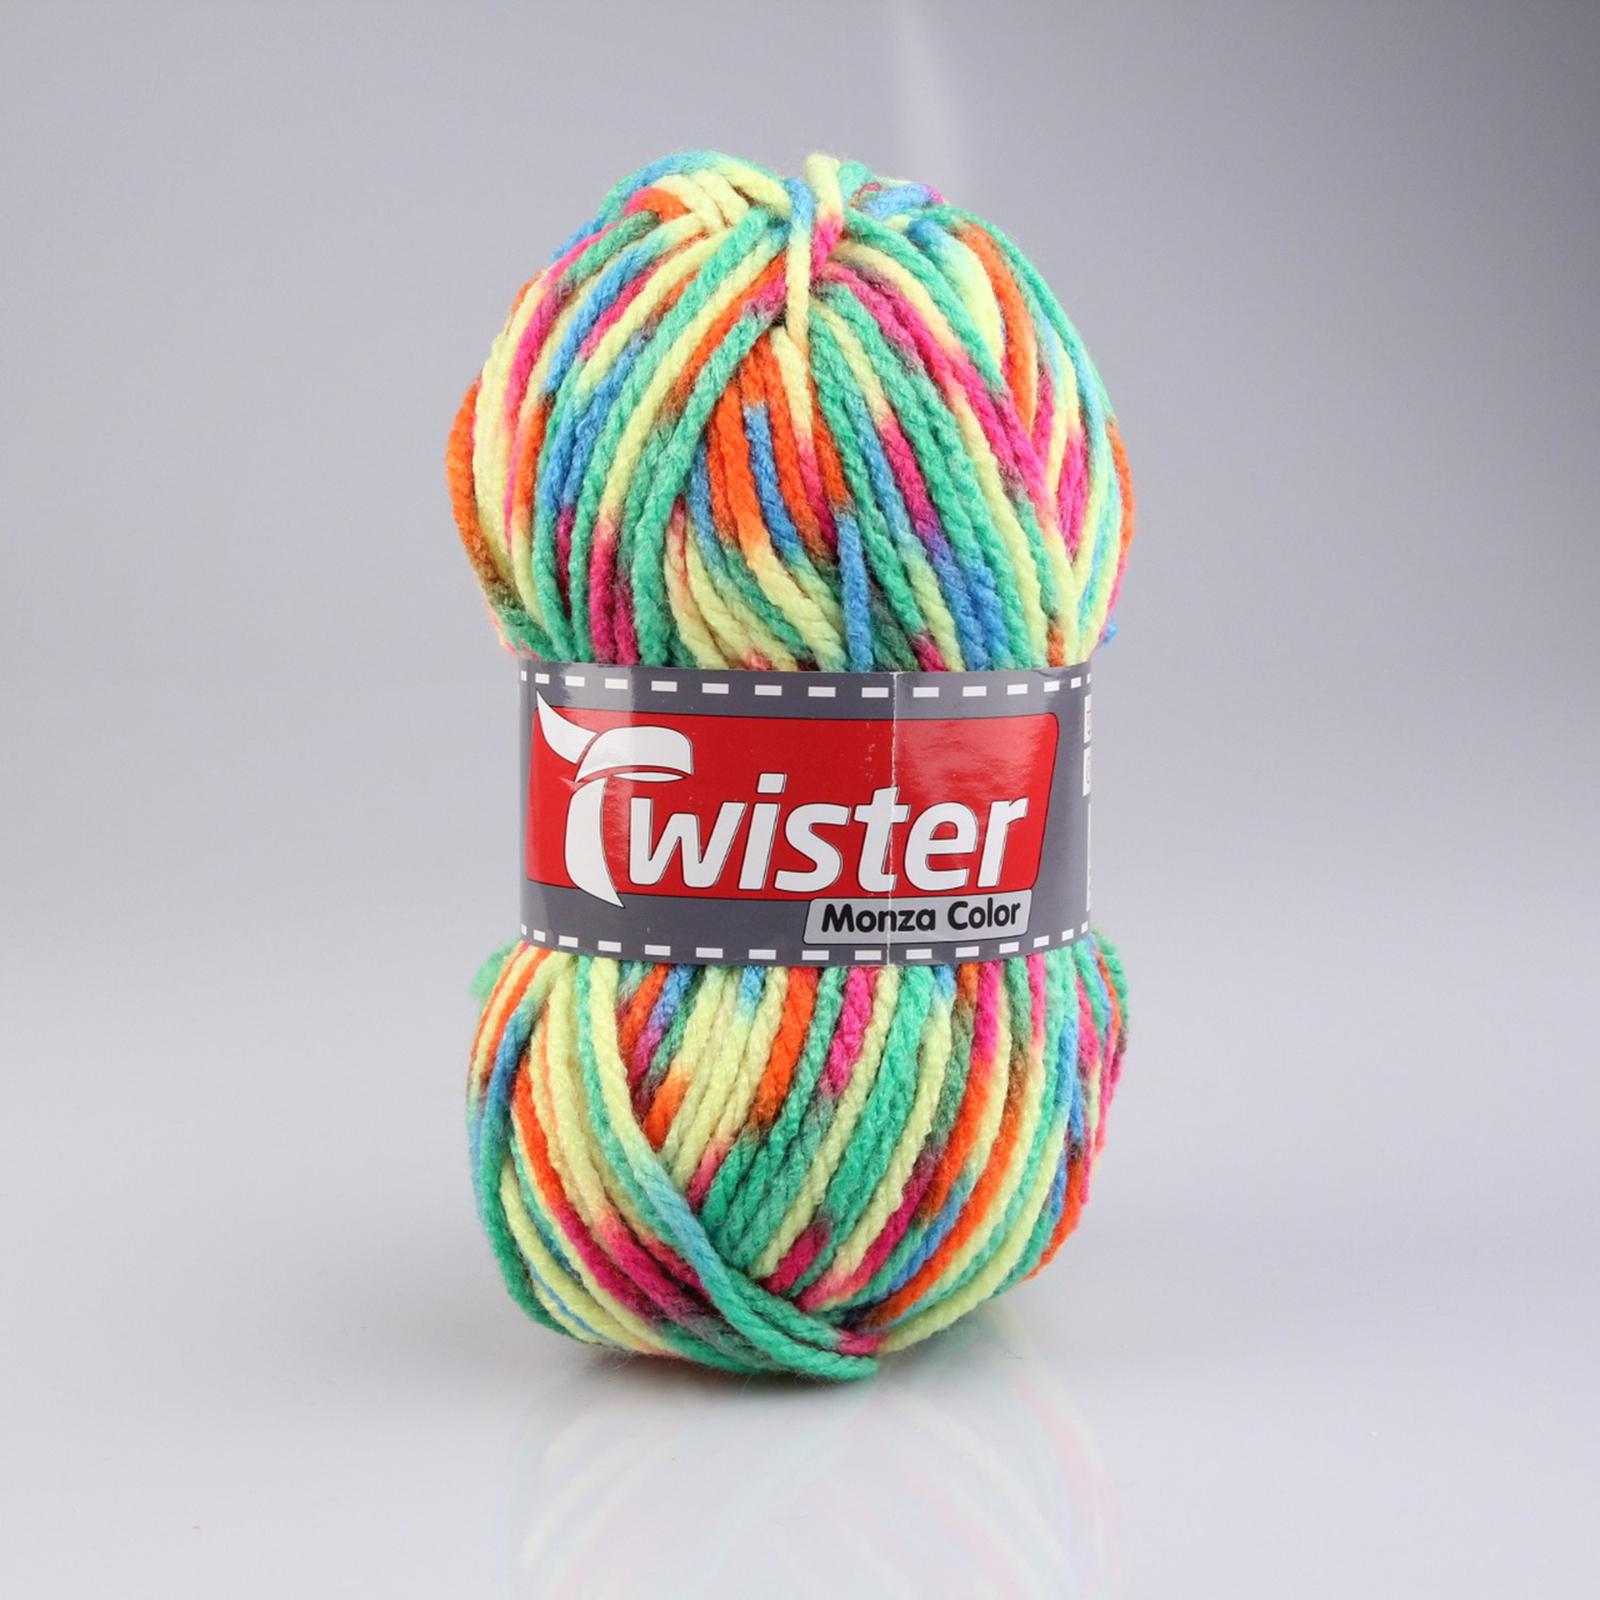 ROLLER Wolle Twister Monza 200g wei/ß